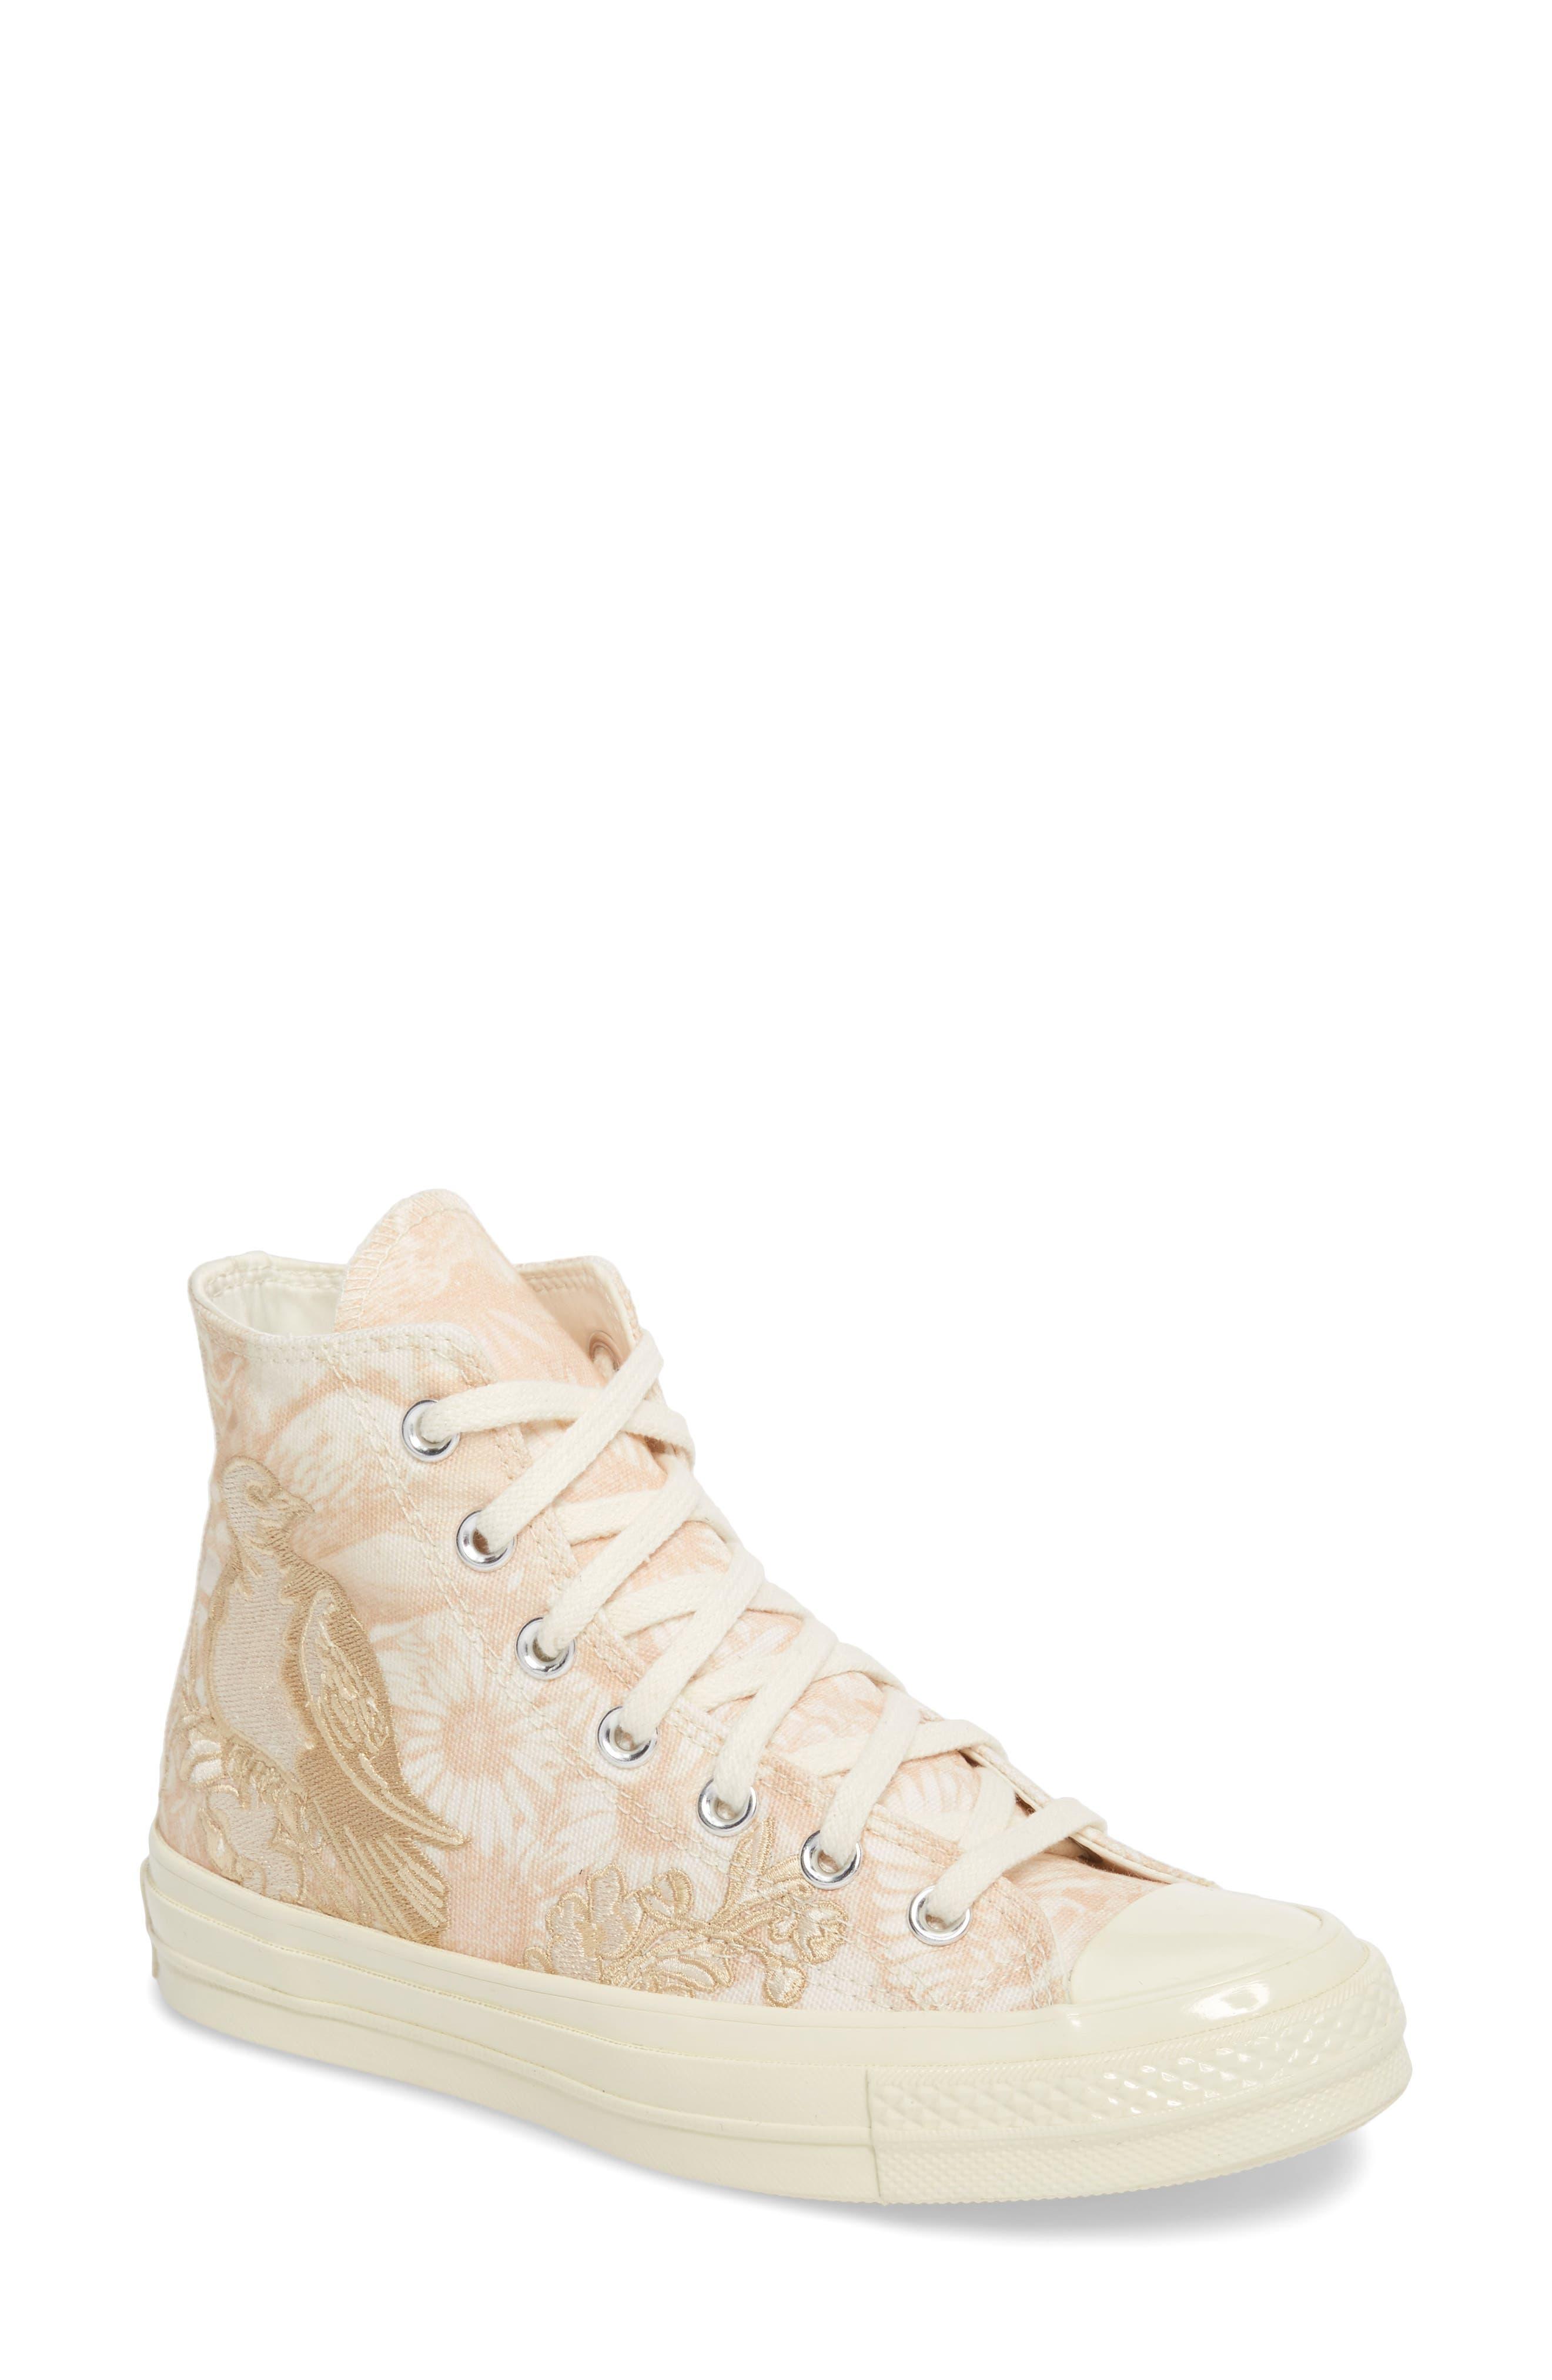 Converse Chuck Taylor® All Star® 70 Spring Forward High Top Sneaker (Women)